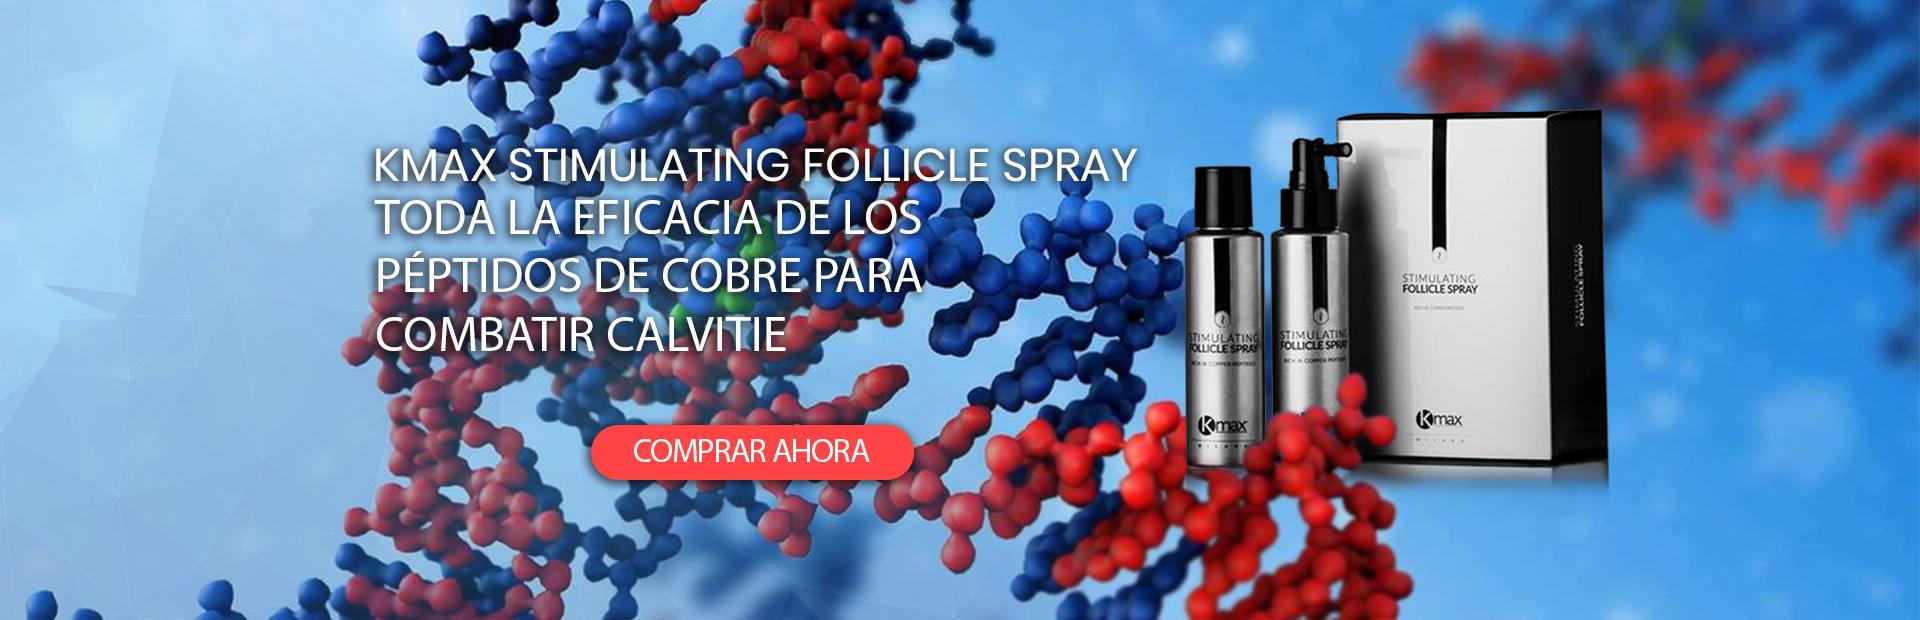 Kmax stimulating follice spray